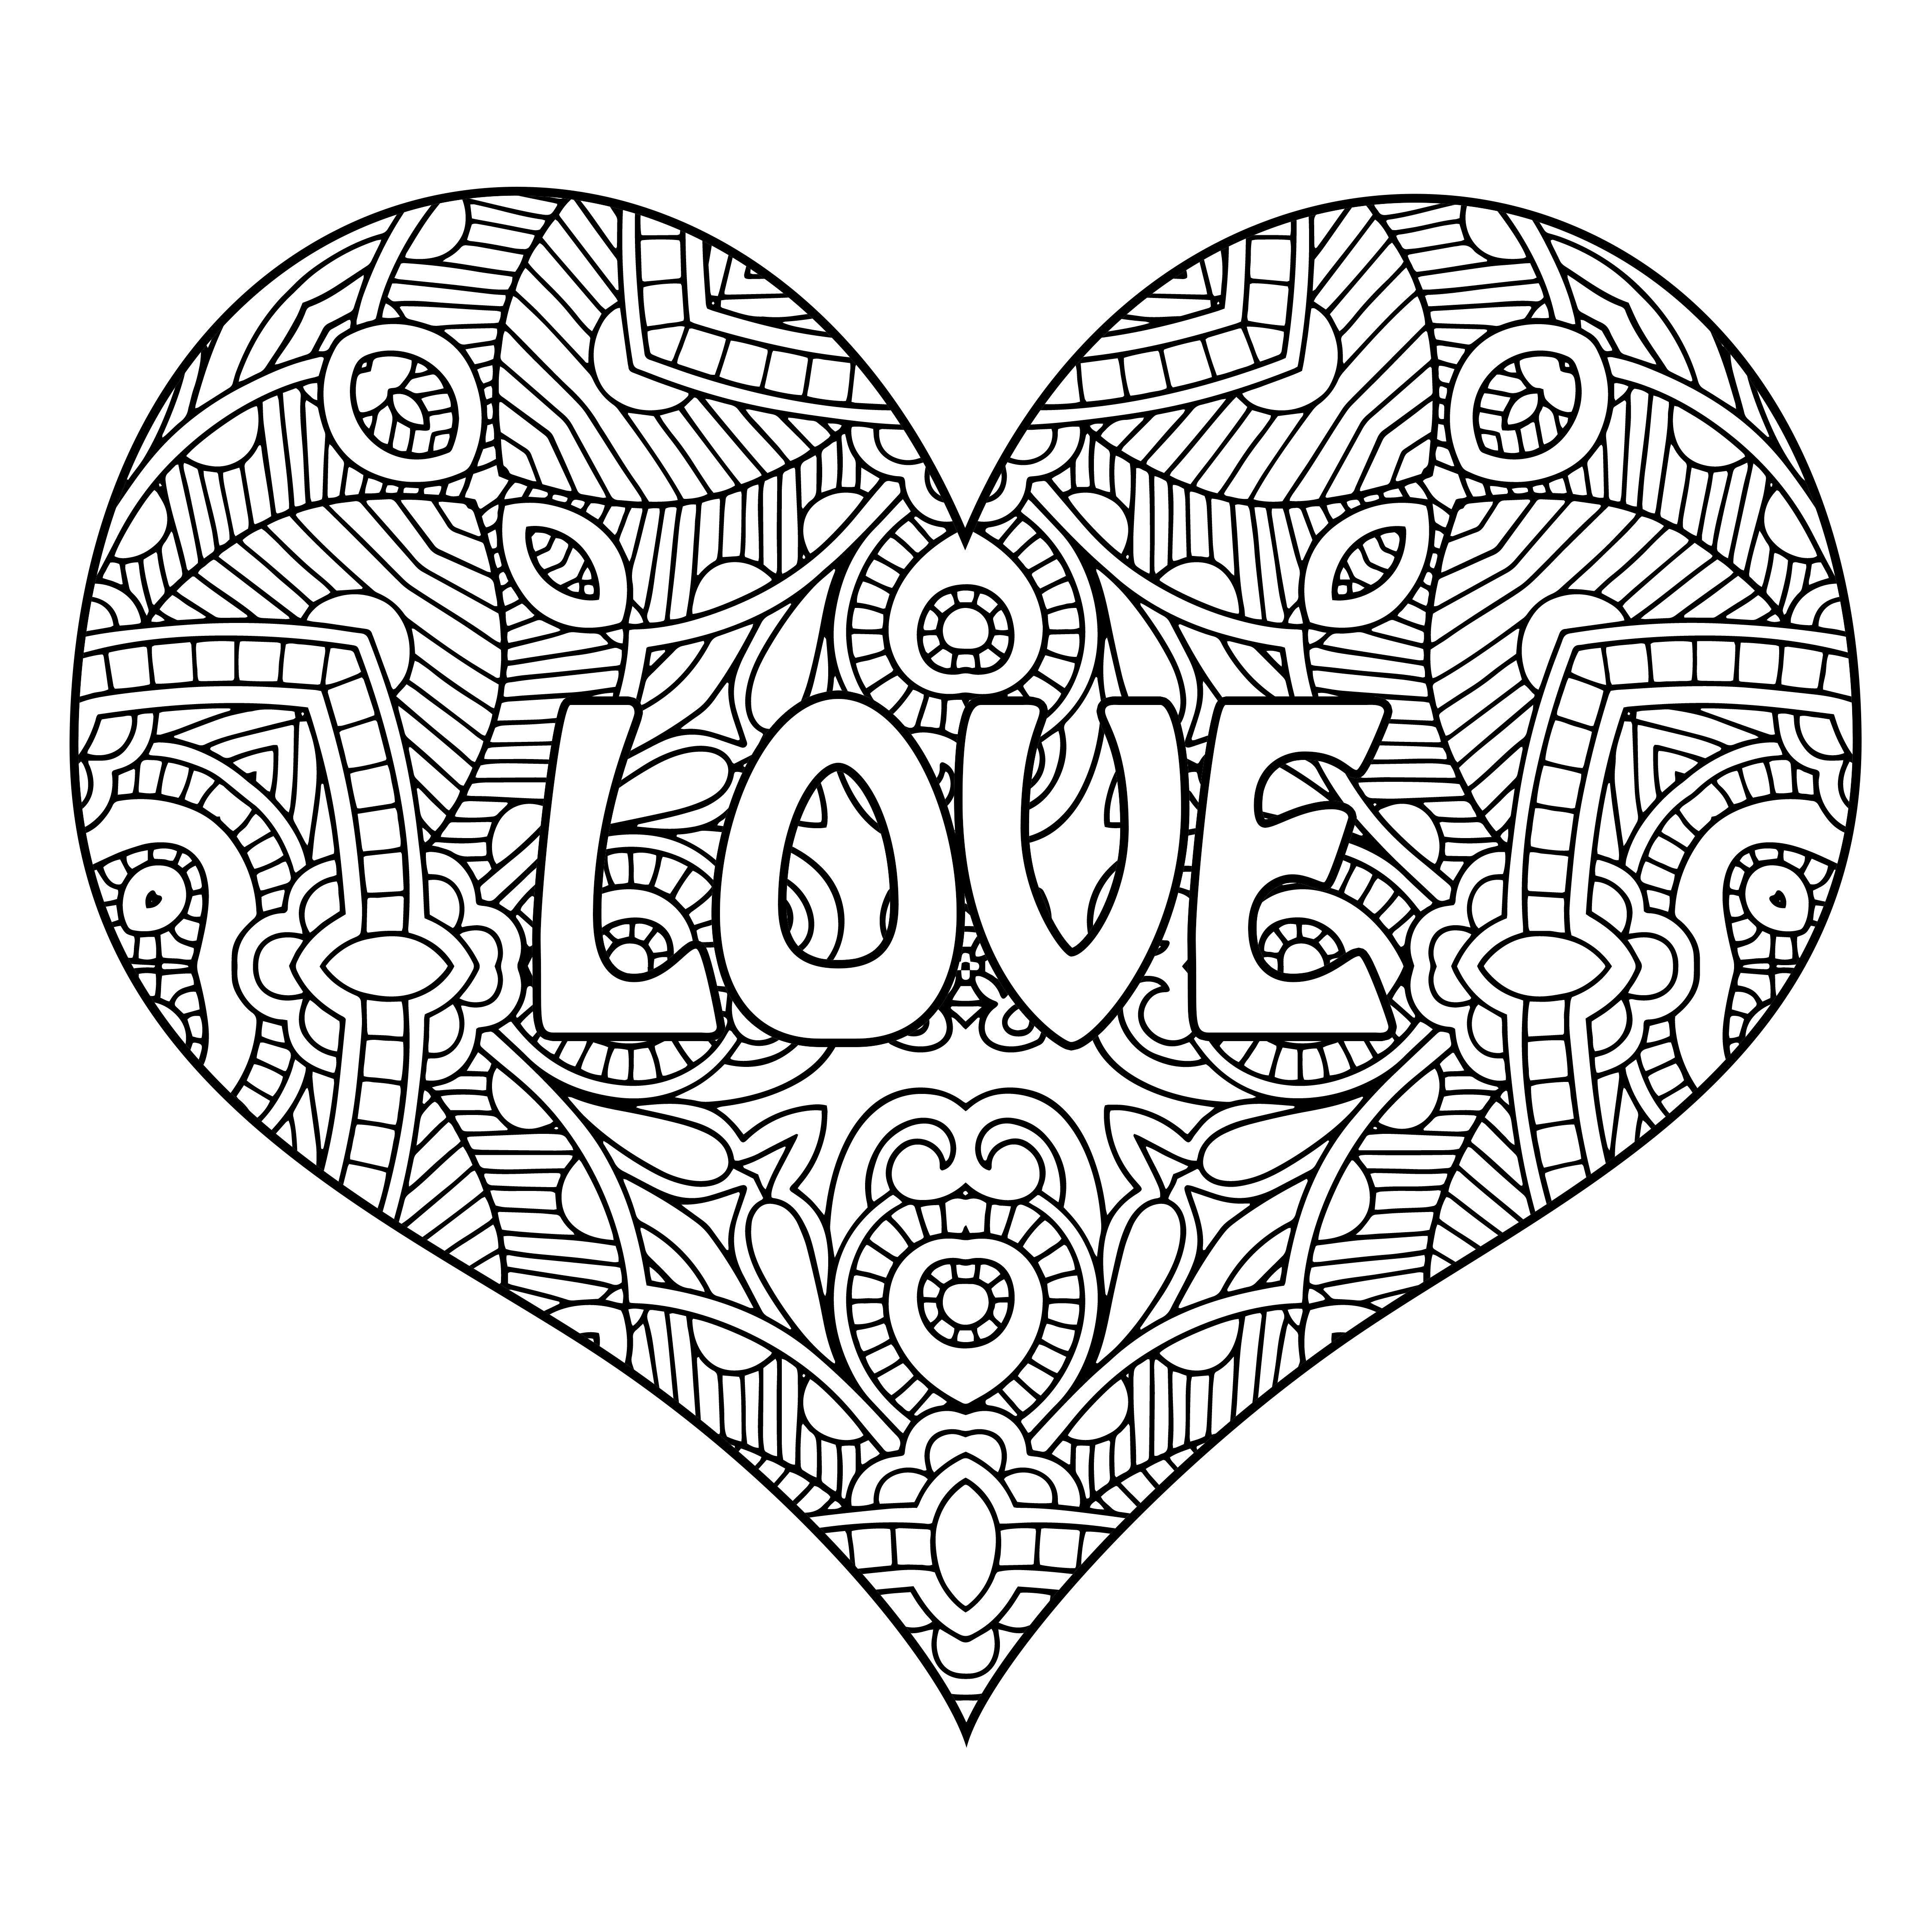 Http Www Allfreeadultcoloringbooks Com Singleheart Love 15 Jpg